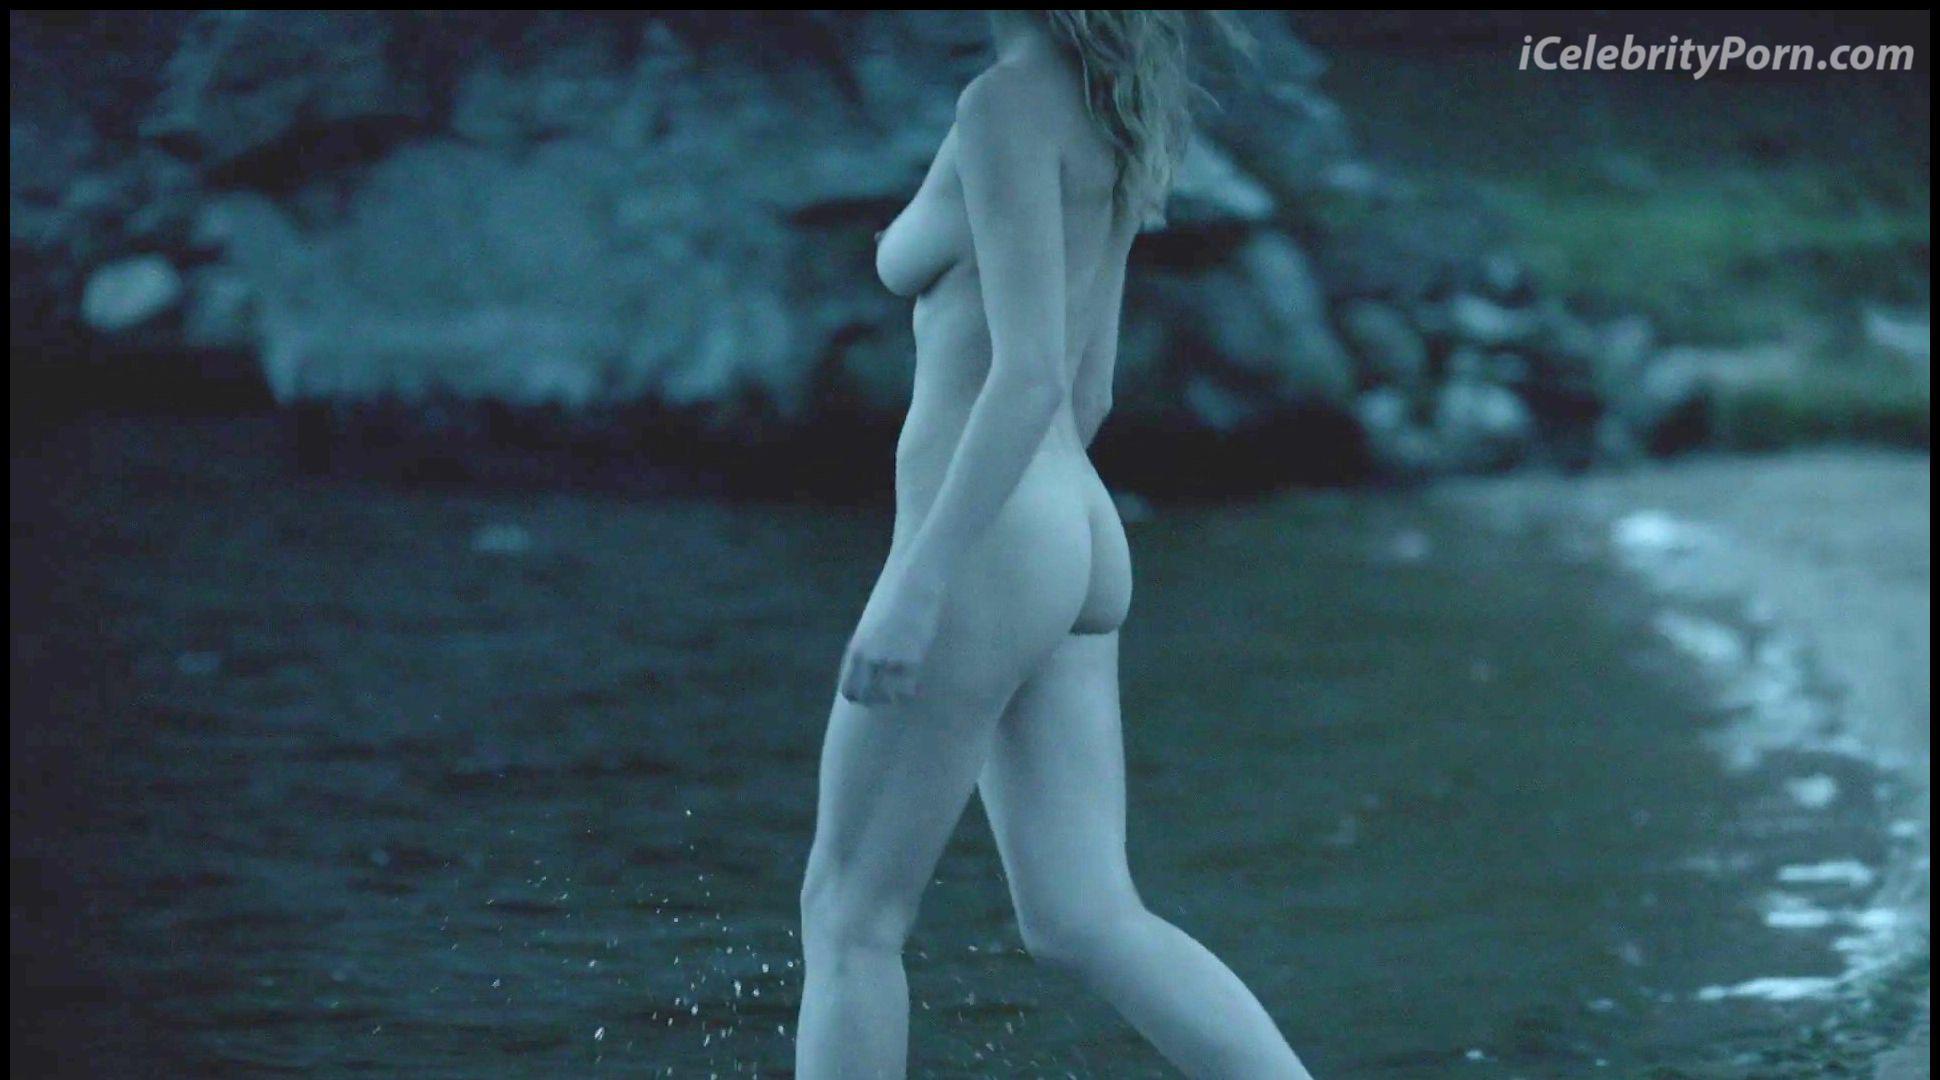 Gaia weiss desnuda en vikingos 6